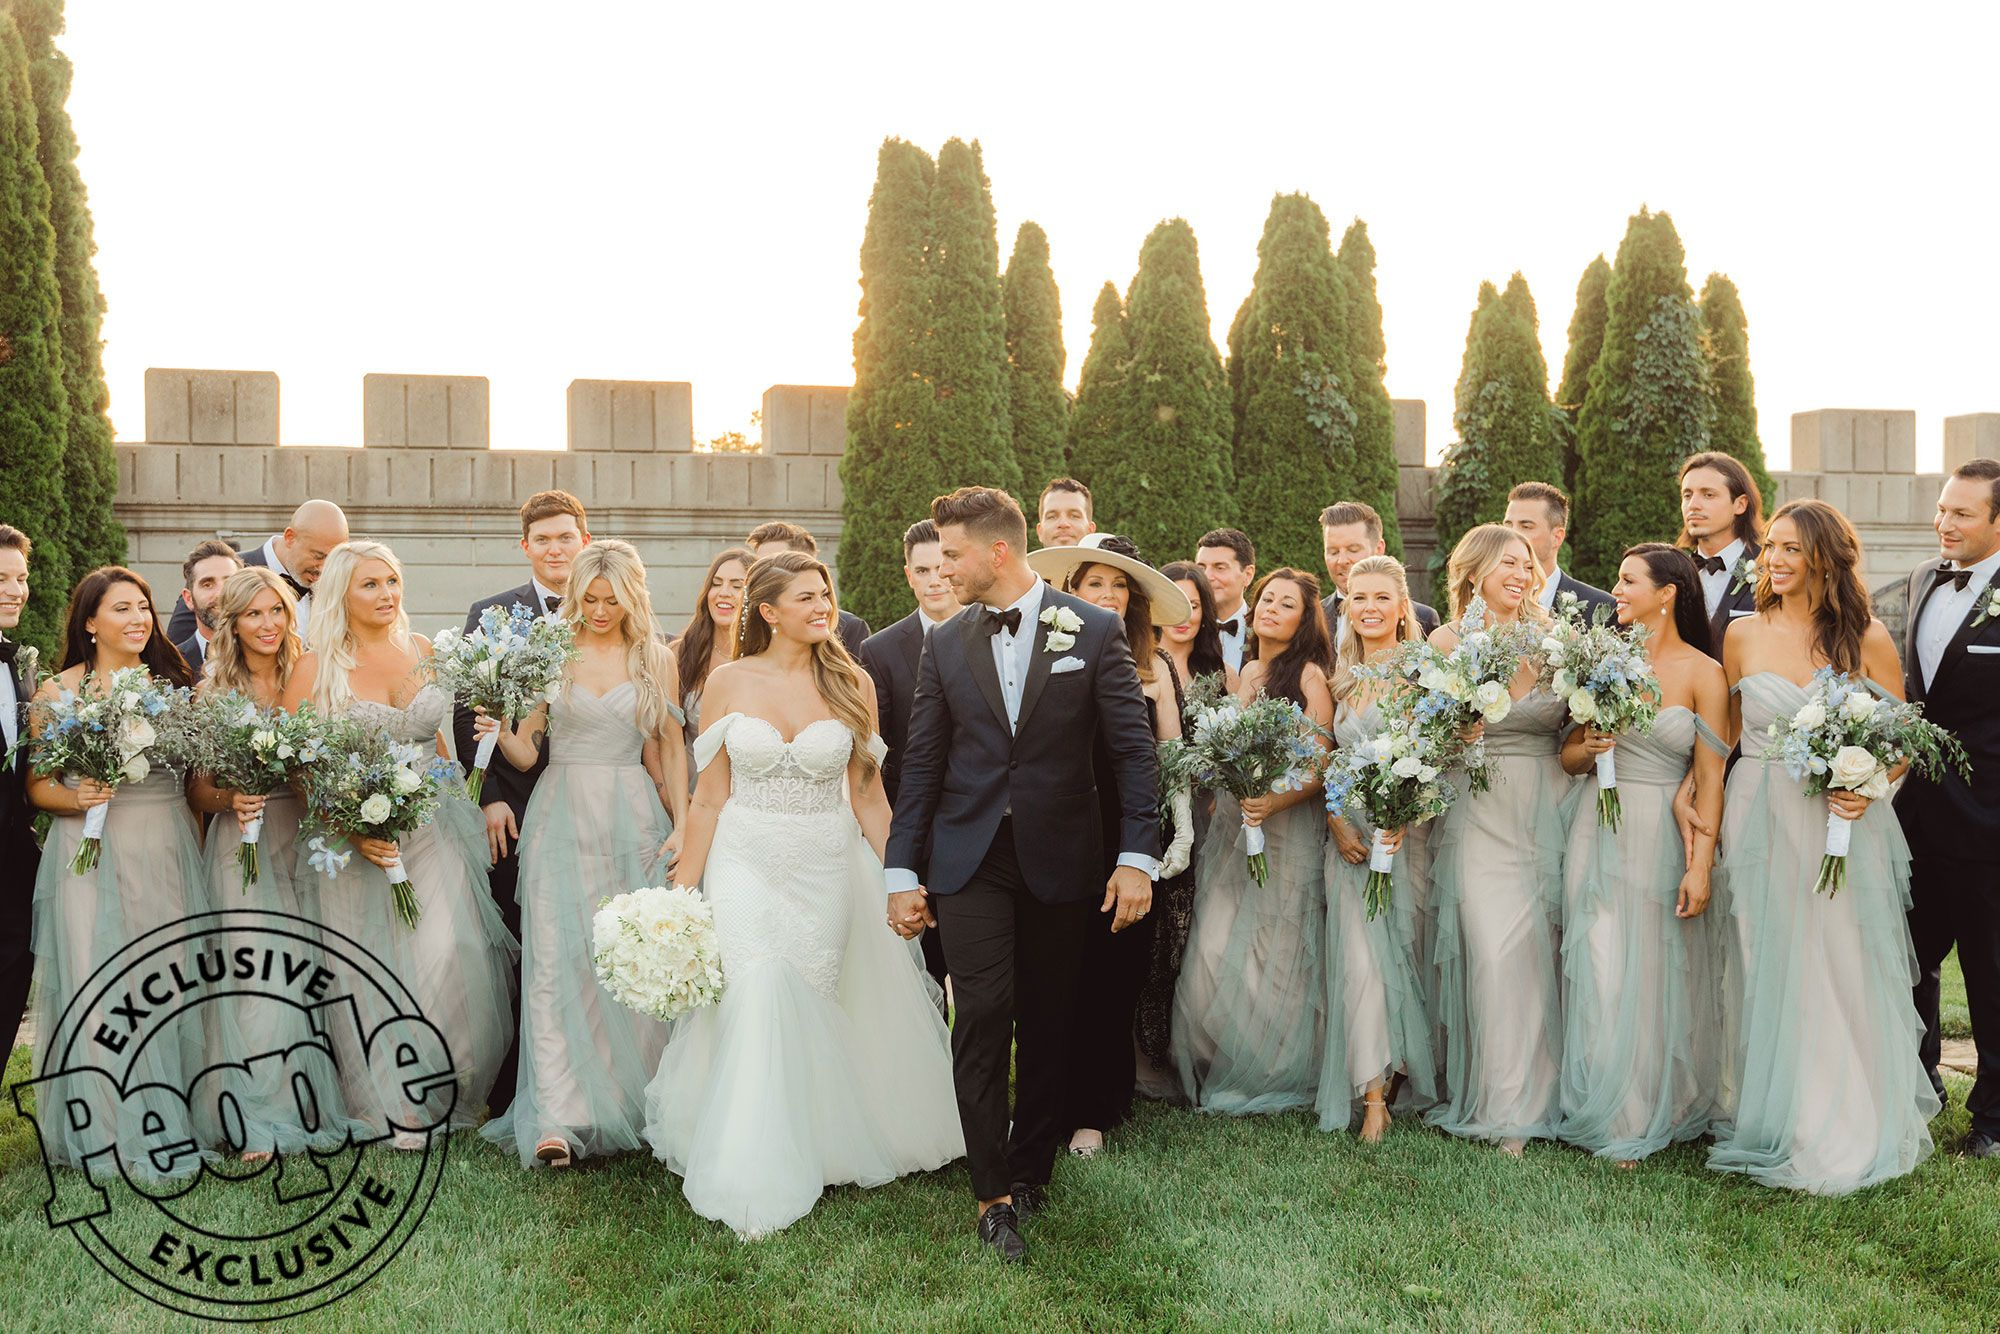 Vanderpump Rules Jax Taylor Marries Brittany Cartwright Inside Their Fairy Tale Wedding Gorgeous Bridesmaid Dresses Beautiful Wedding Photos Bridesmaid